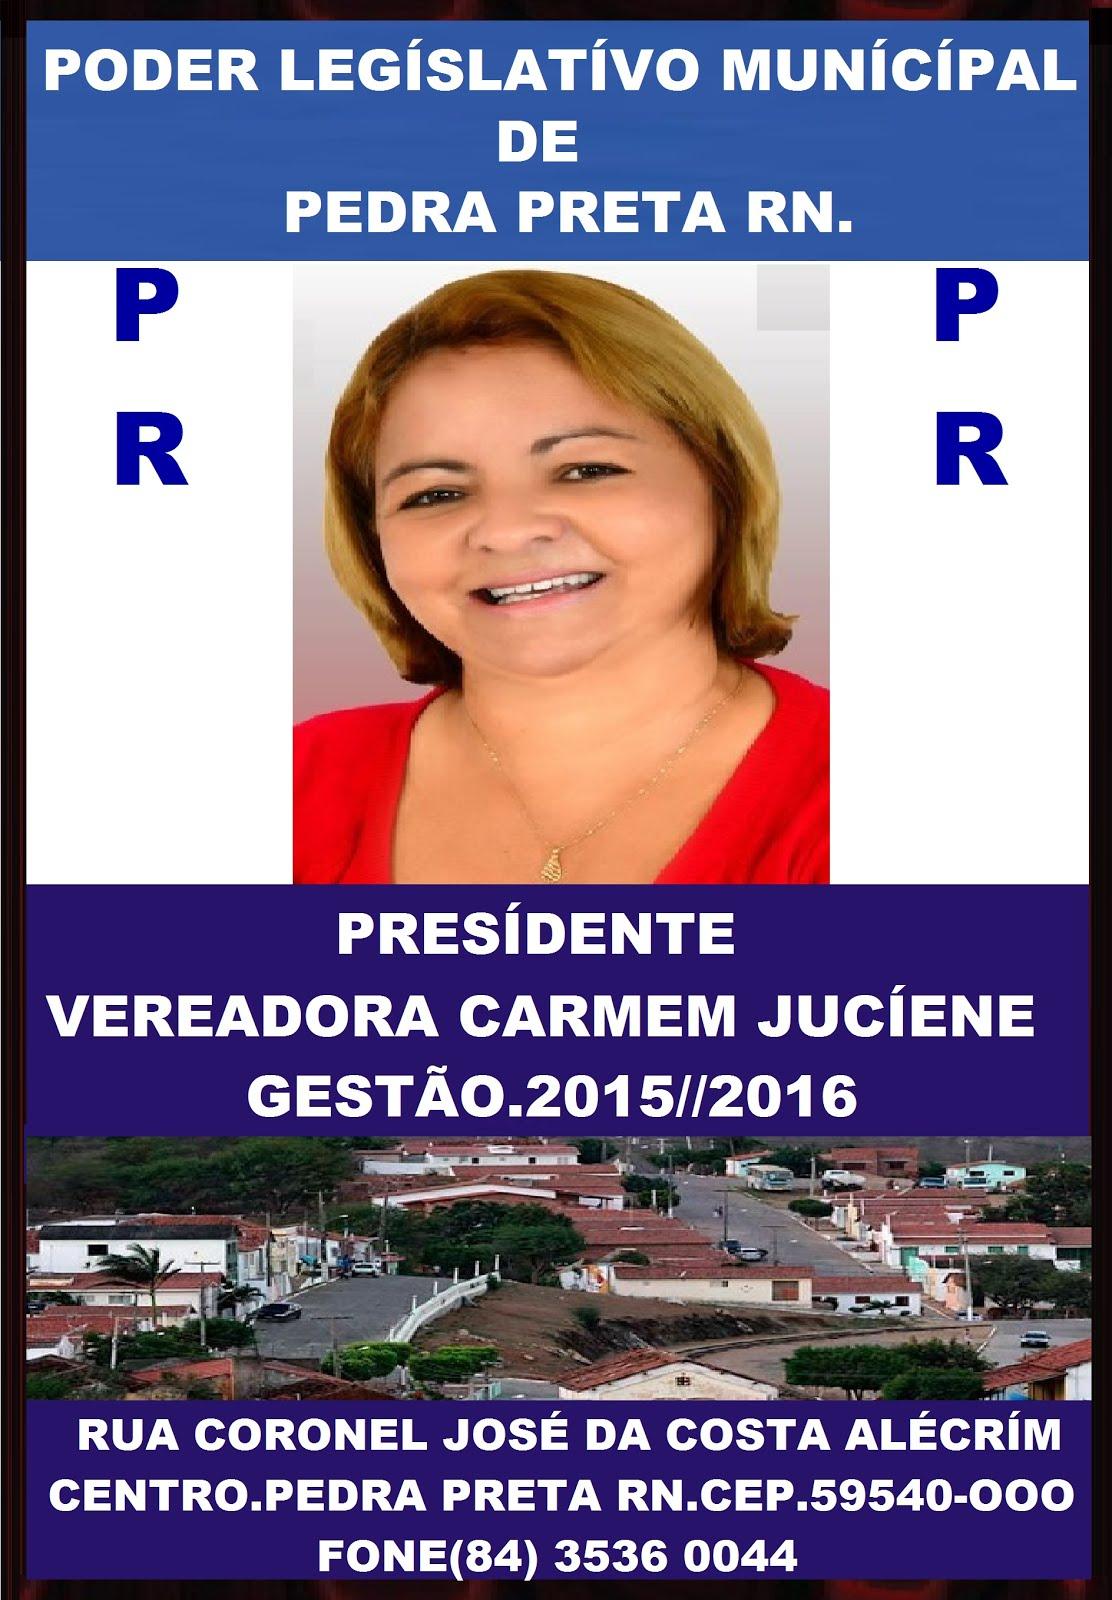 VEREADORA CARMEM JUCIENE PEDRA PRETA